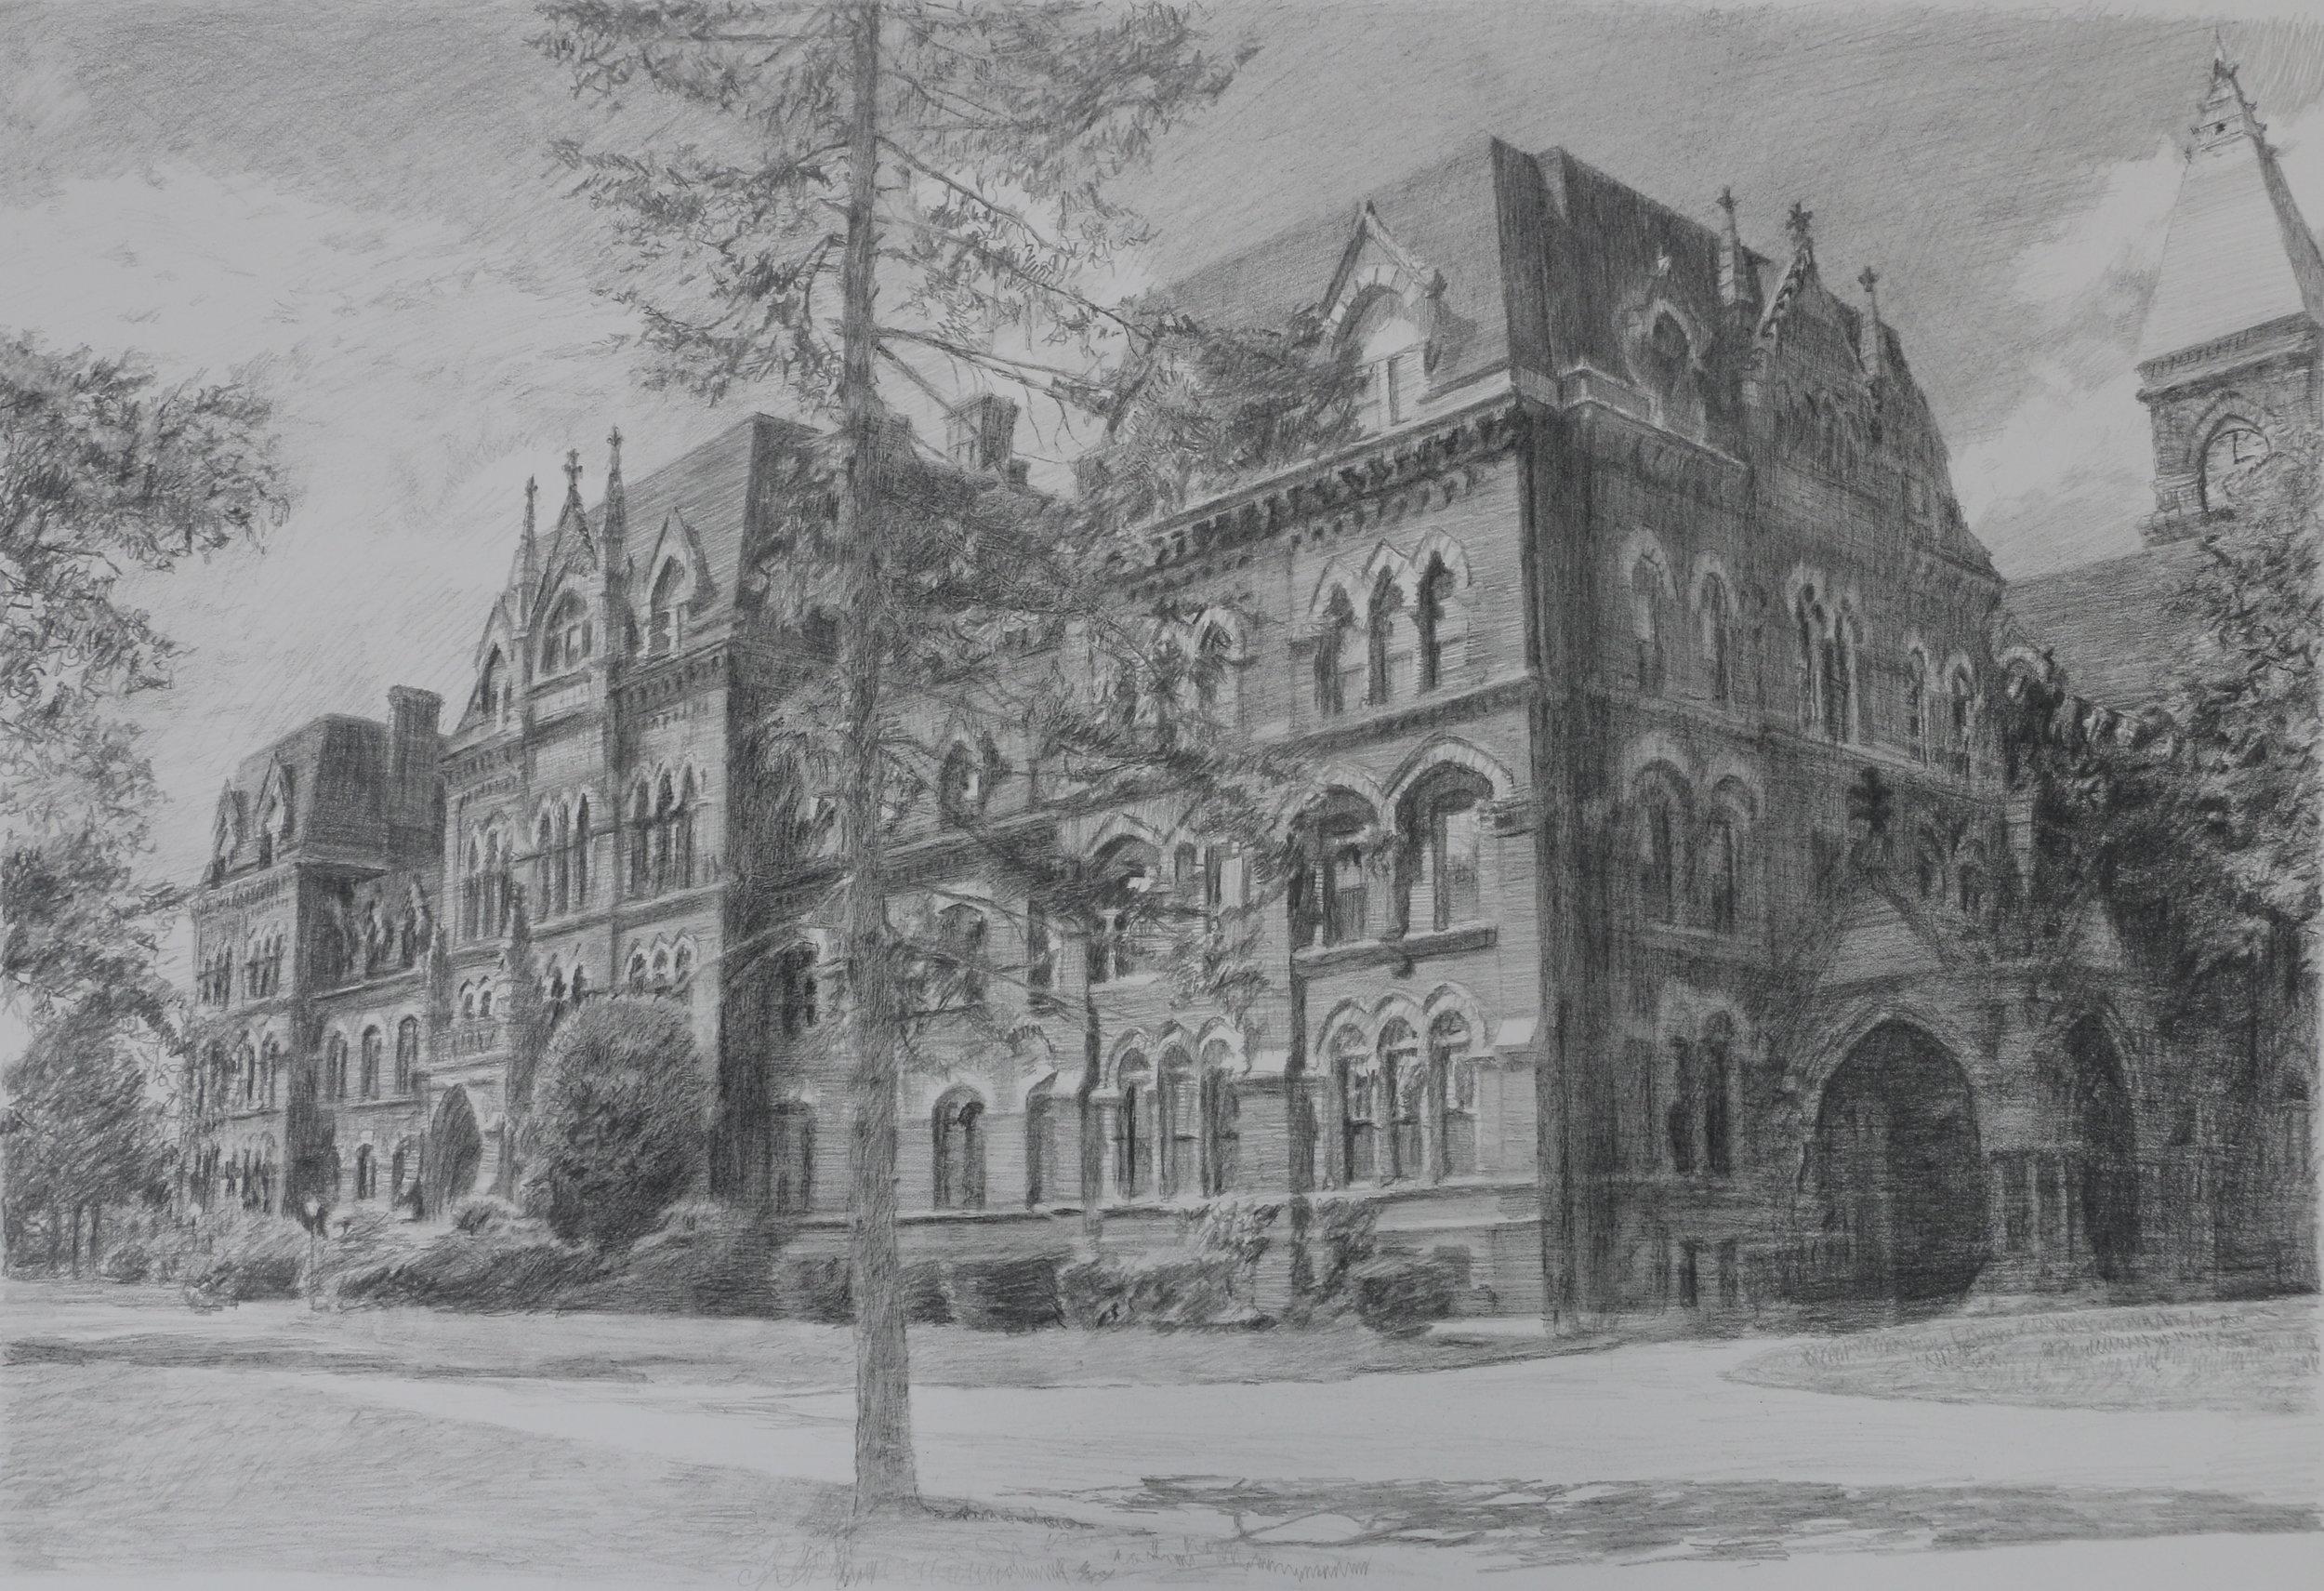 St. Paul's School|MichaelWhite